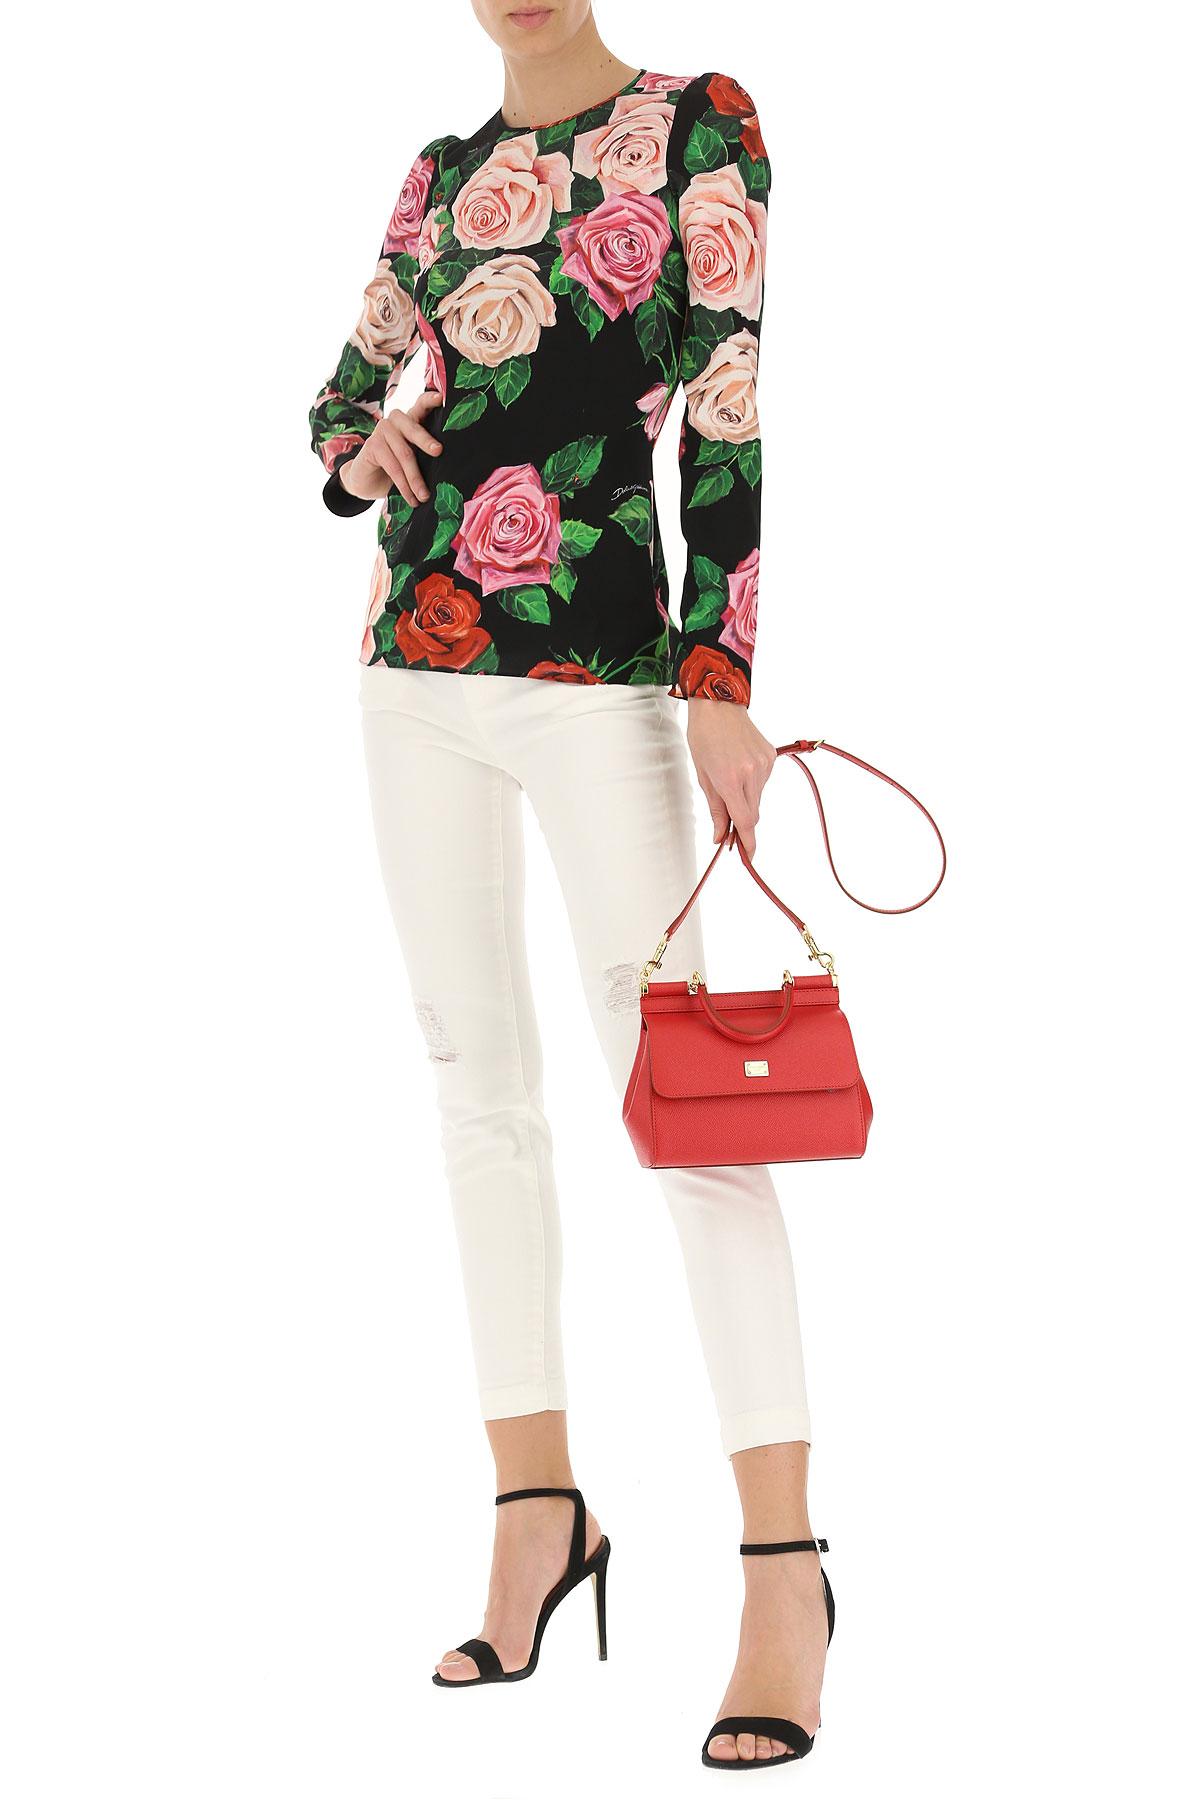 Gabbana Mujer nbsp; Blanco Dolce 2019 Ropa Primavera verano Para amp; BxnwnH5